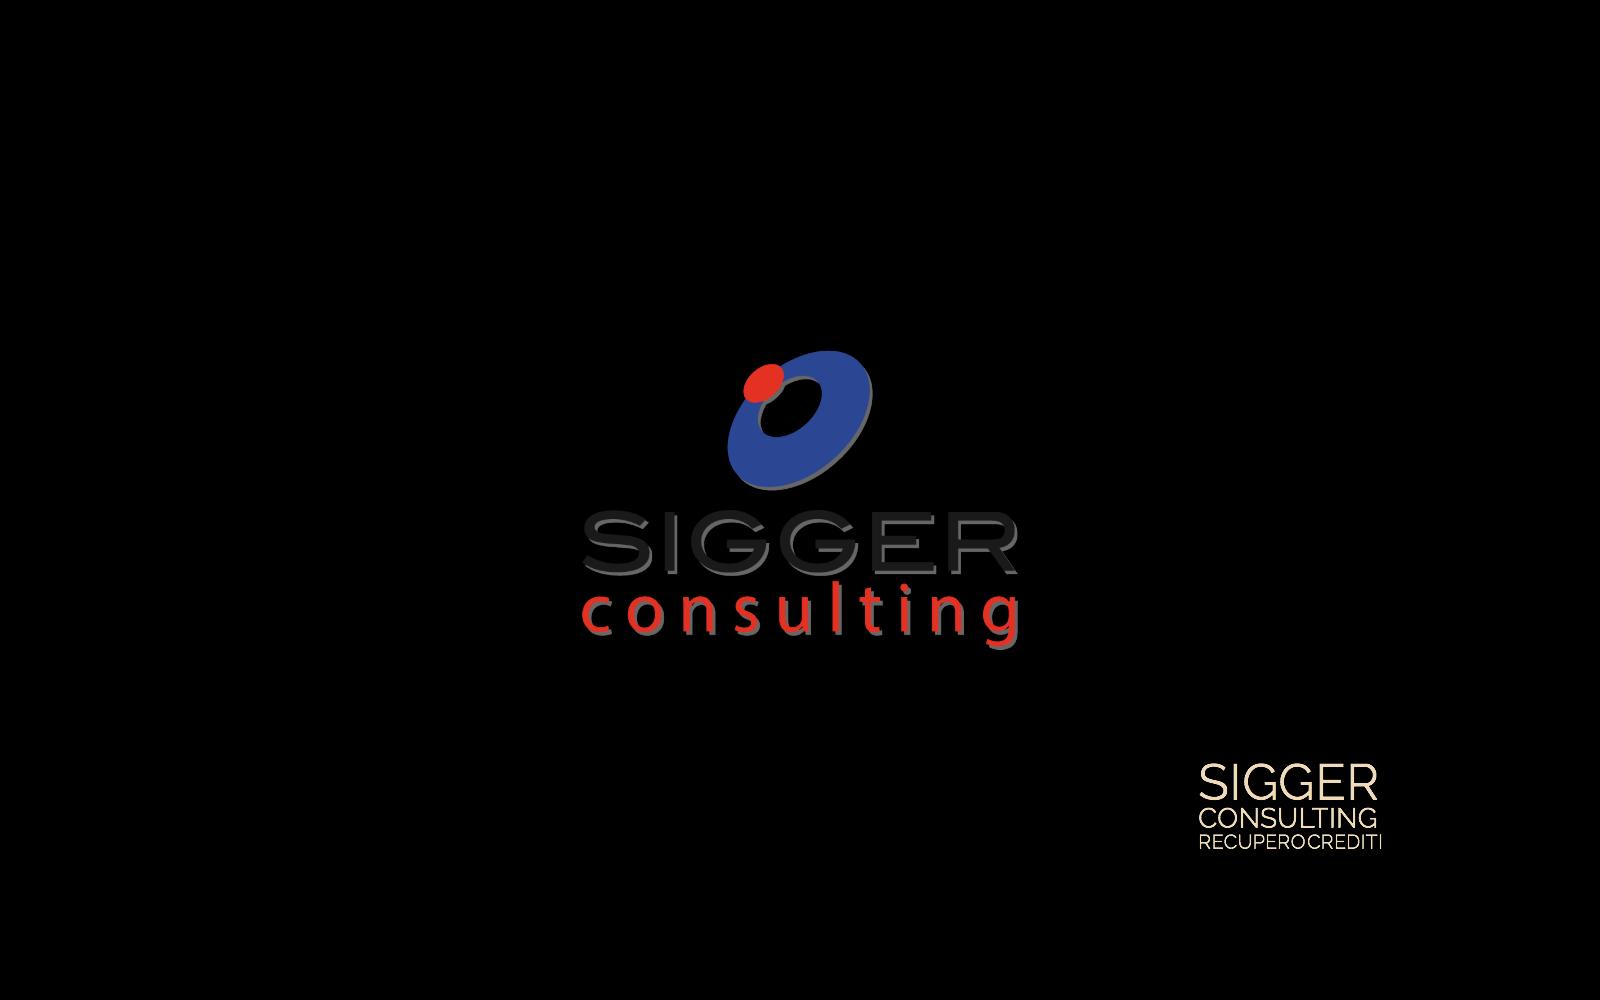 SIGGER CONSULTING RECUPERO CREDITI